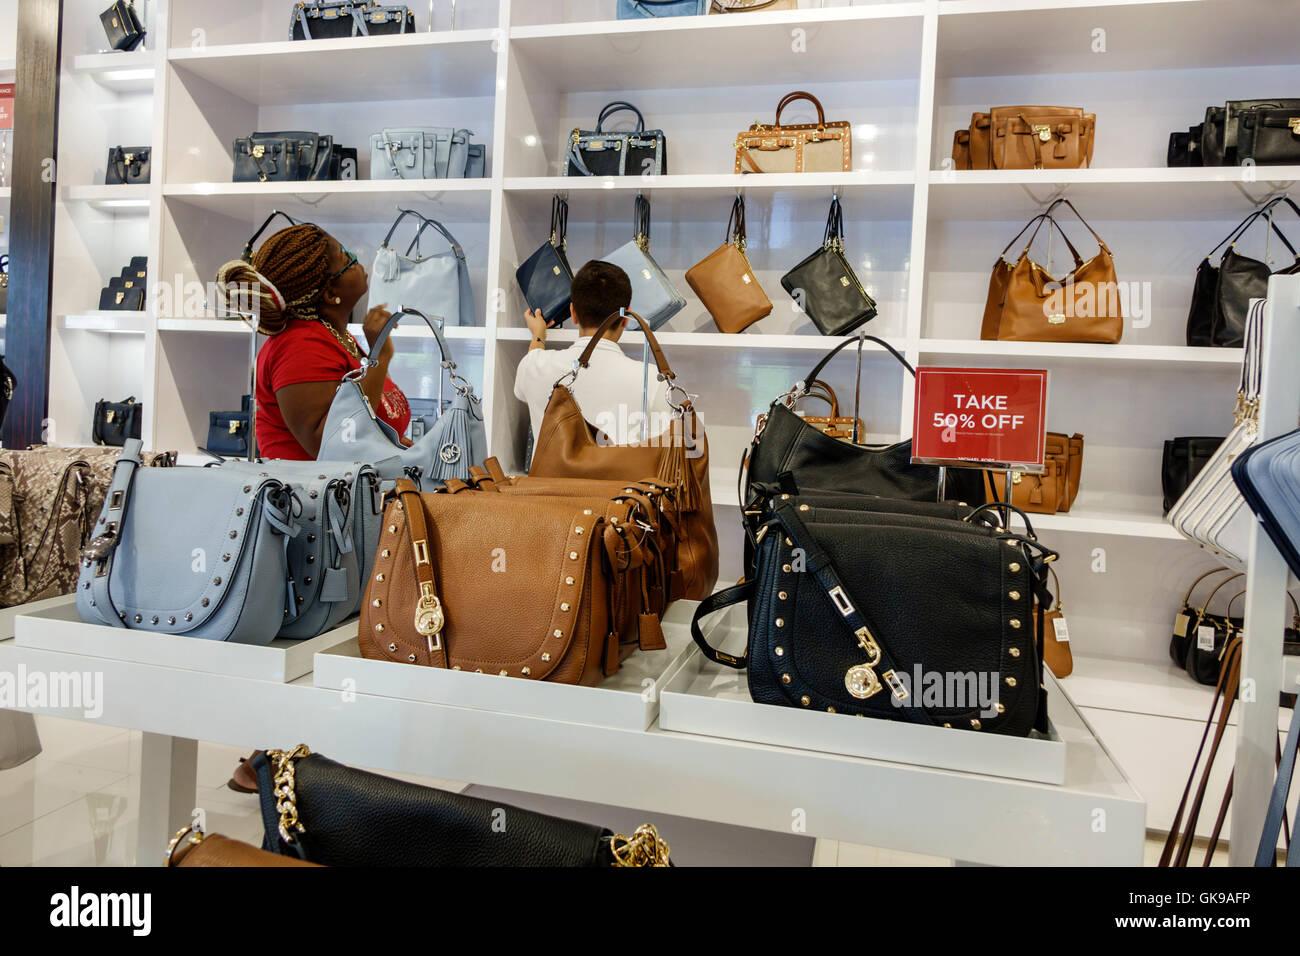 eed253464f93 Florida Ellenton Ellenton Premium Outlets mall shopping center business  retail Michael Kors outlet store women s handbags designer brand retail  displa